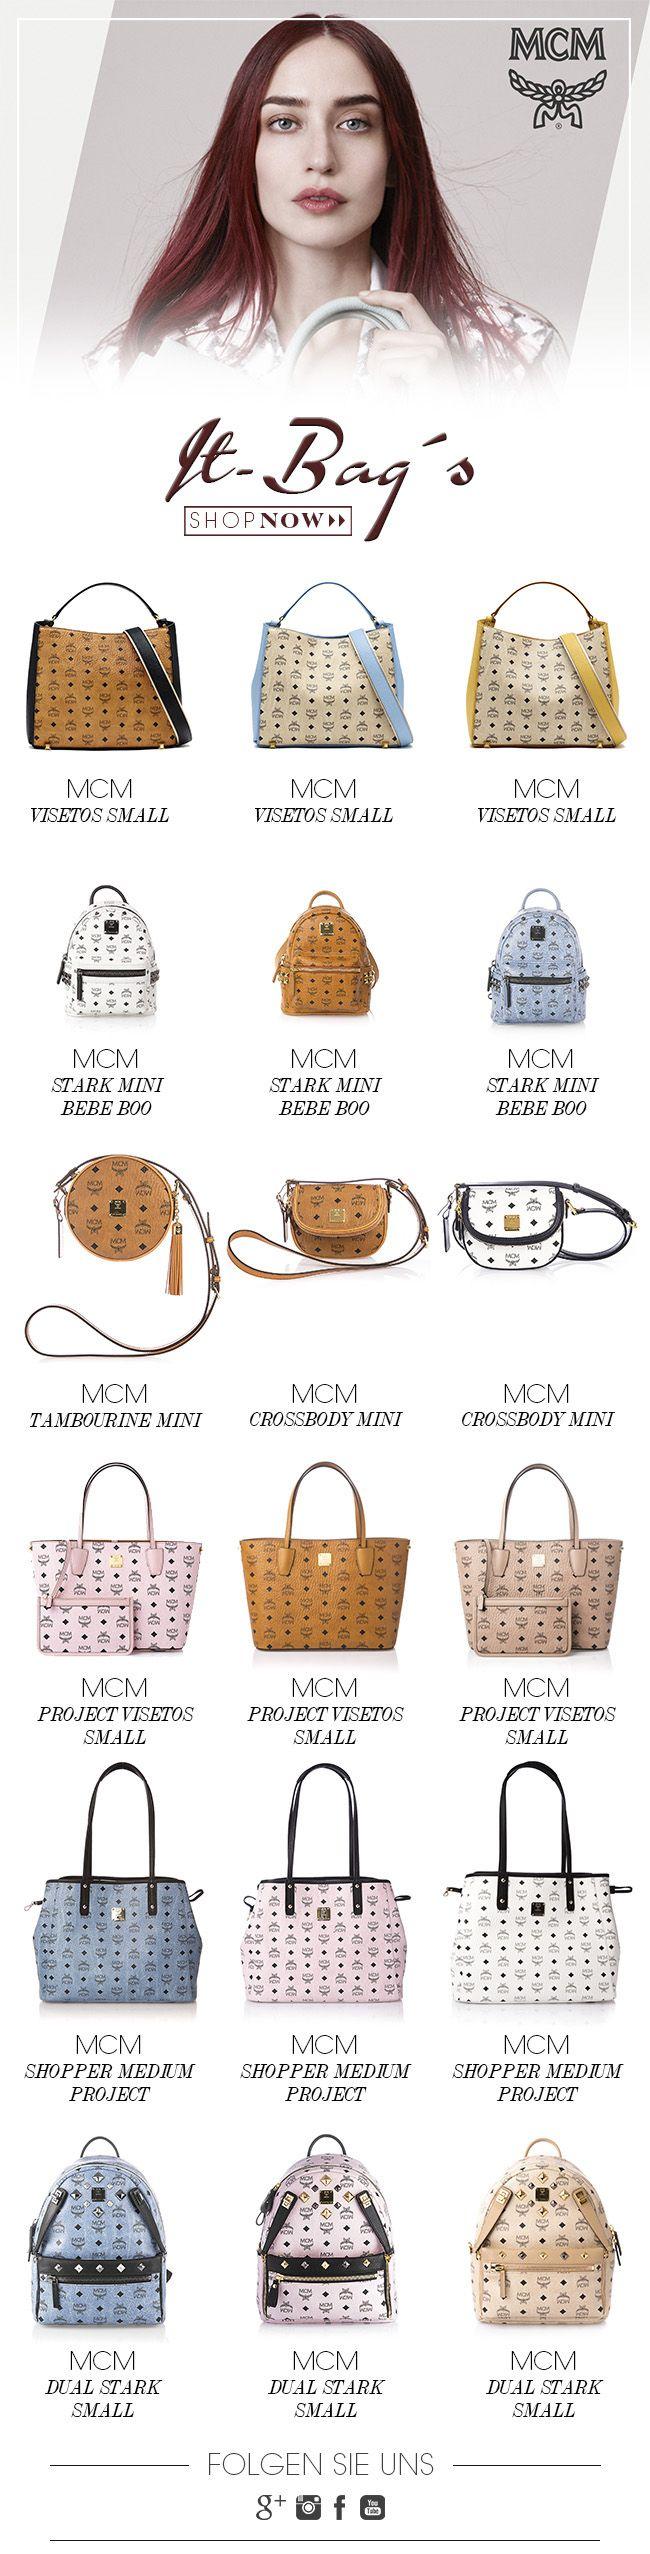 #musthave #fashion #newin #modeblog #fashionstore #onlineshop #shop #online  #sailerstyle #onlineshop #fashion #blog #trusted #stylenews #newsletter #design  #labels #mcm #handtaschen #itbag  #bagoftheday #fashionbag #fashionbags #fashionbagimport #fashionbagmurah-fashionbagus #handtasche #handtaschen #handtaschenliebe #clutch #clutches #clutchbag #clutchbags #tasche #taschen #mcm #mcmbags #mcmbag #mcmbagpack #mcmbagmurah #mcmbagshop #mcmofficial #mcmmünchen #mcmtasche #mcmtaschen